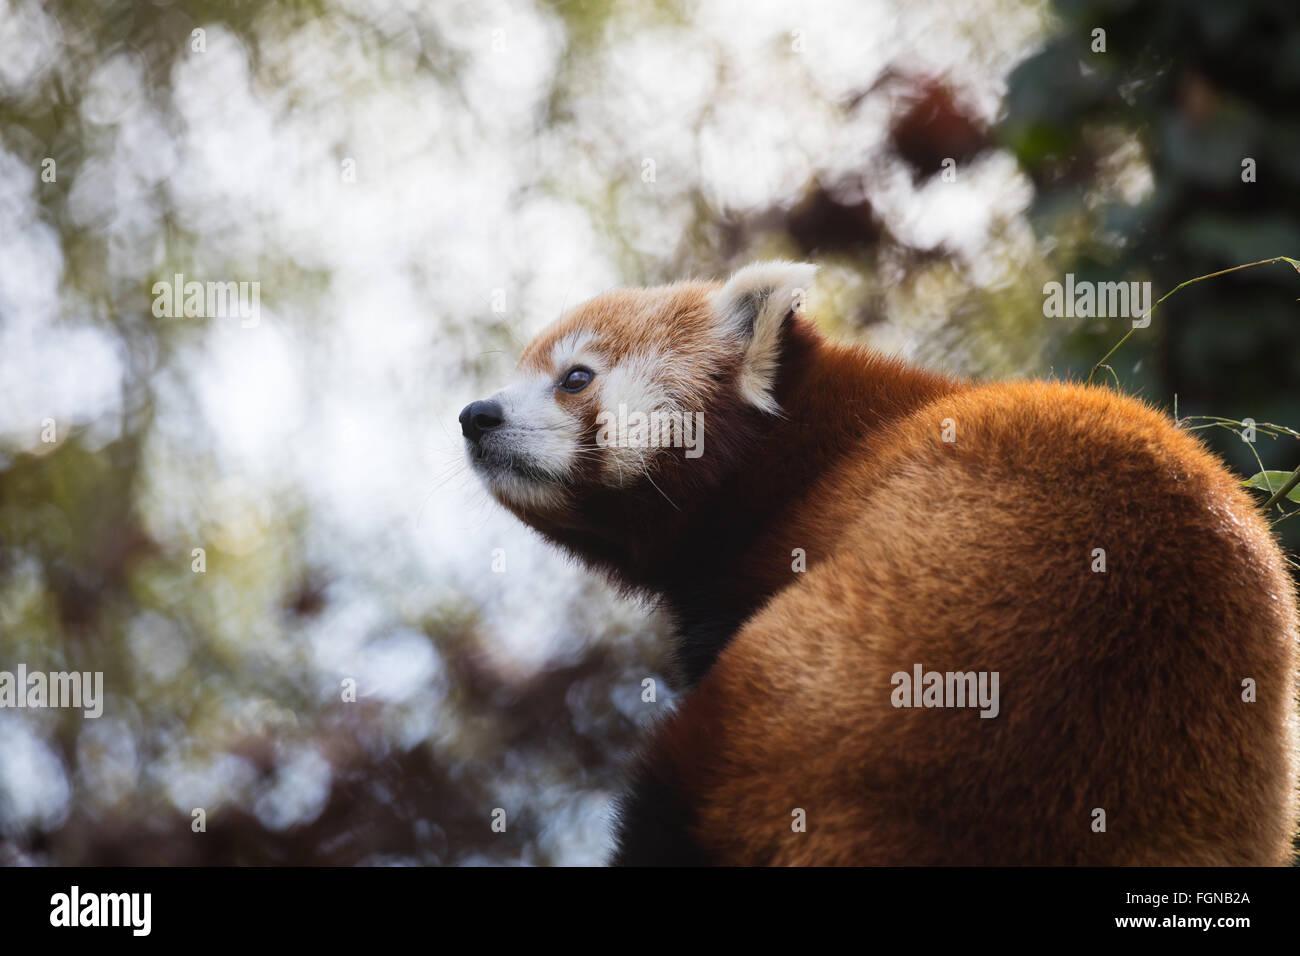 Cute panda rojo (Ailurus fulgens) viendo algo Imagen De Stock